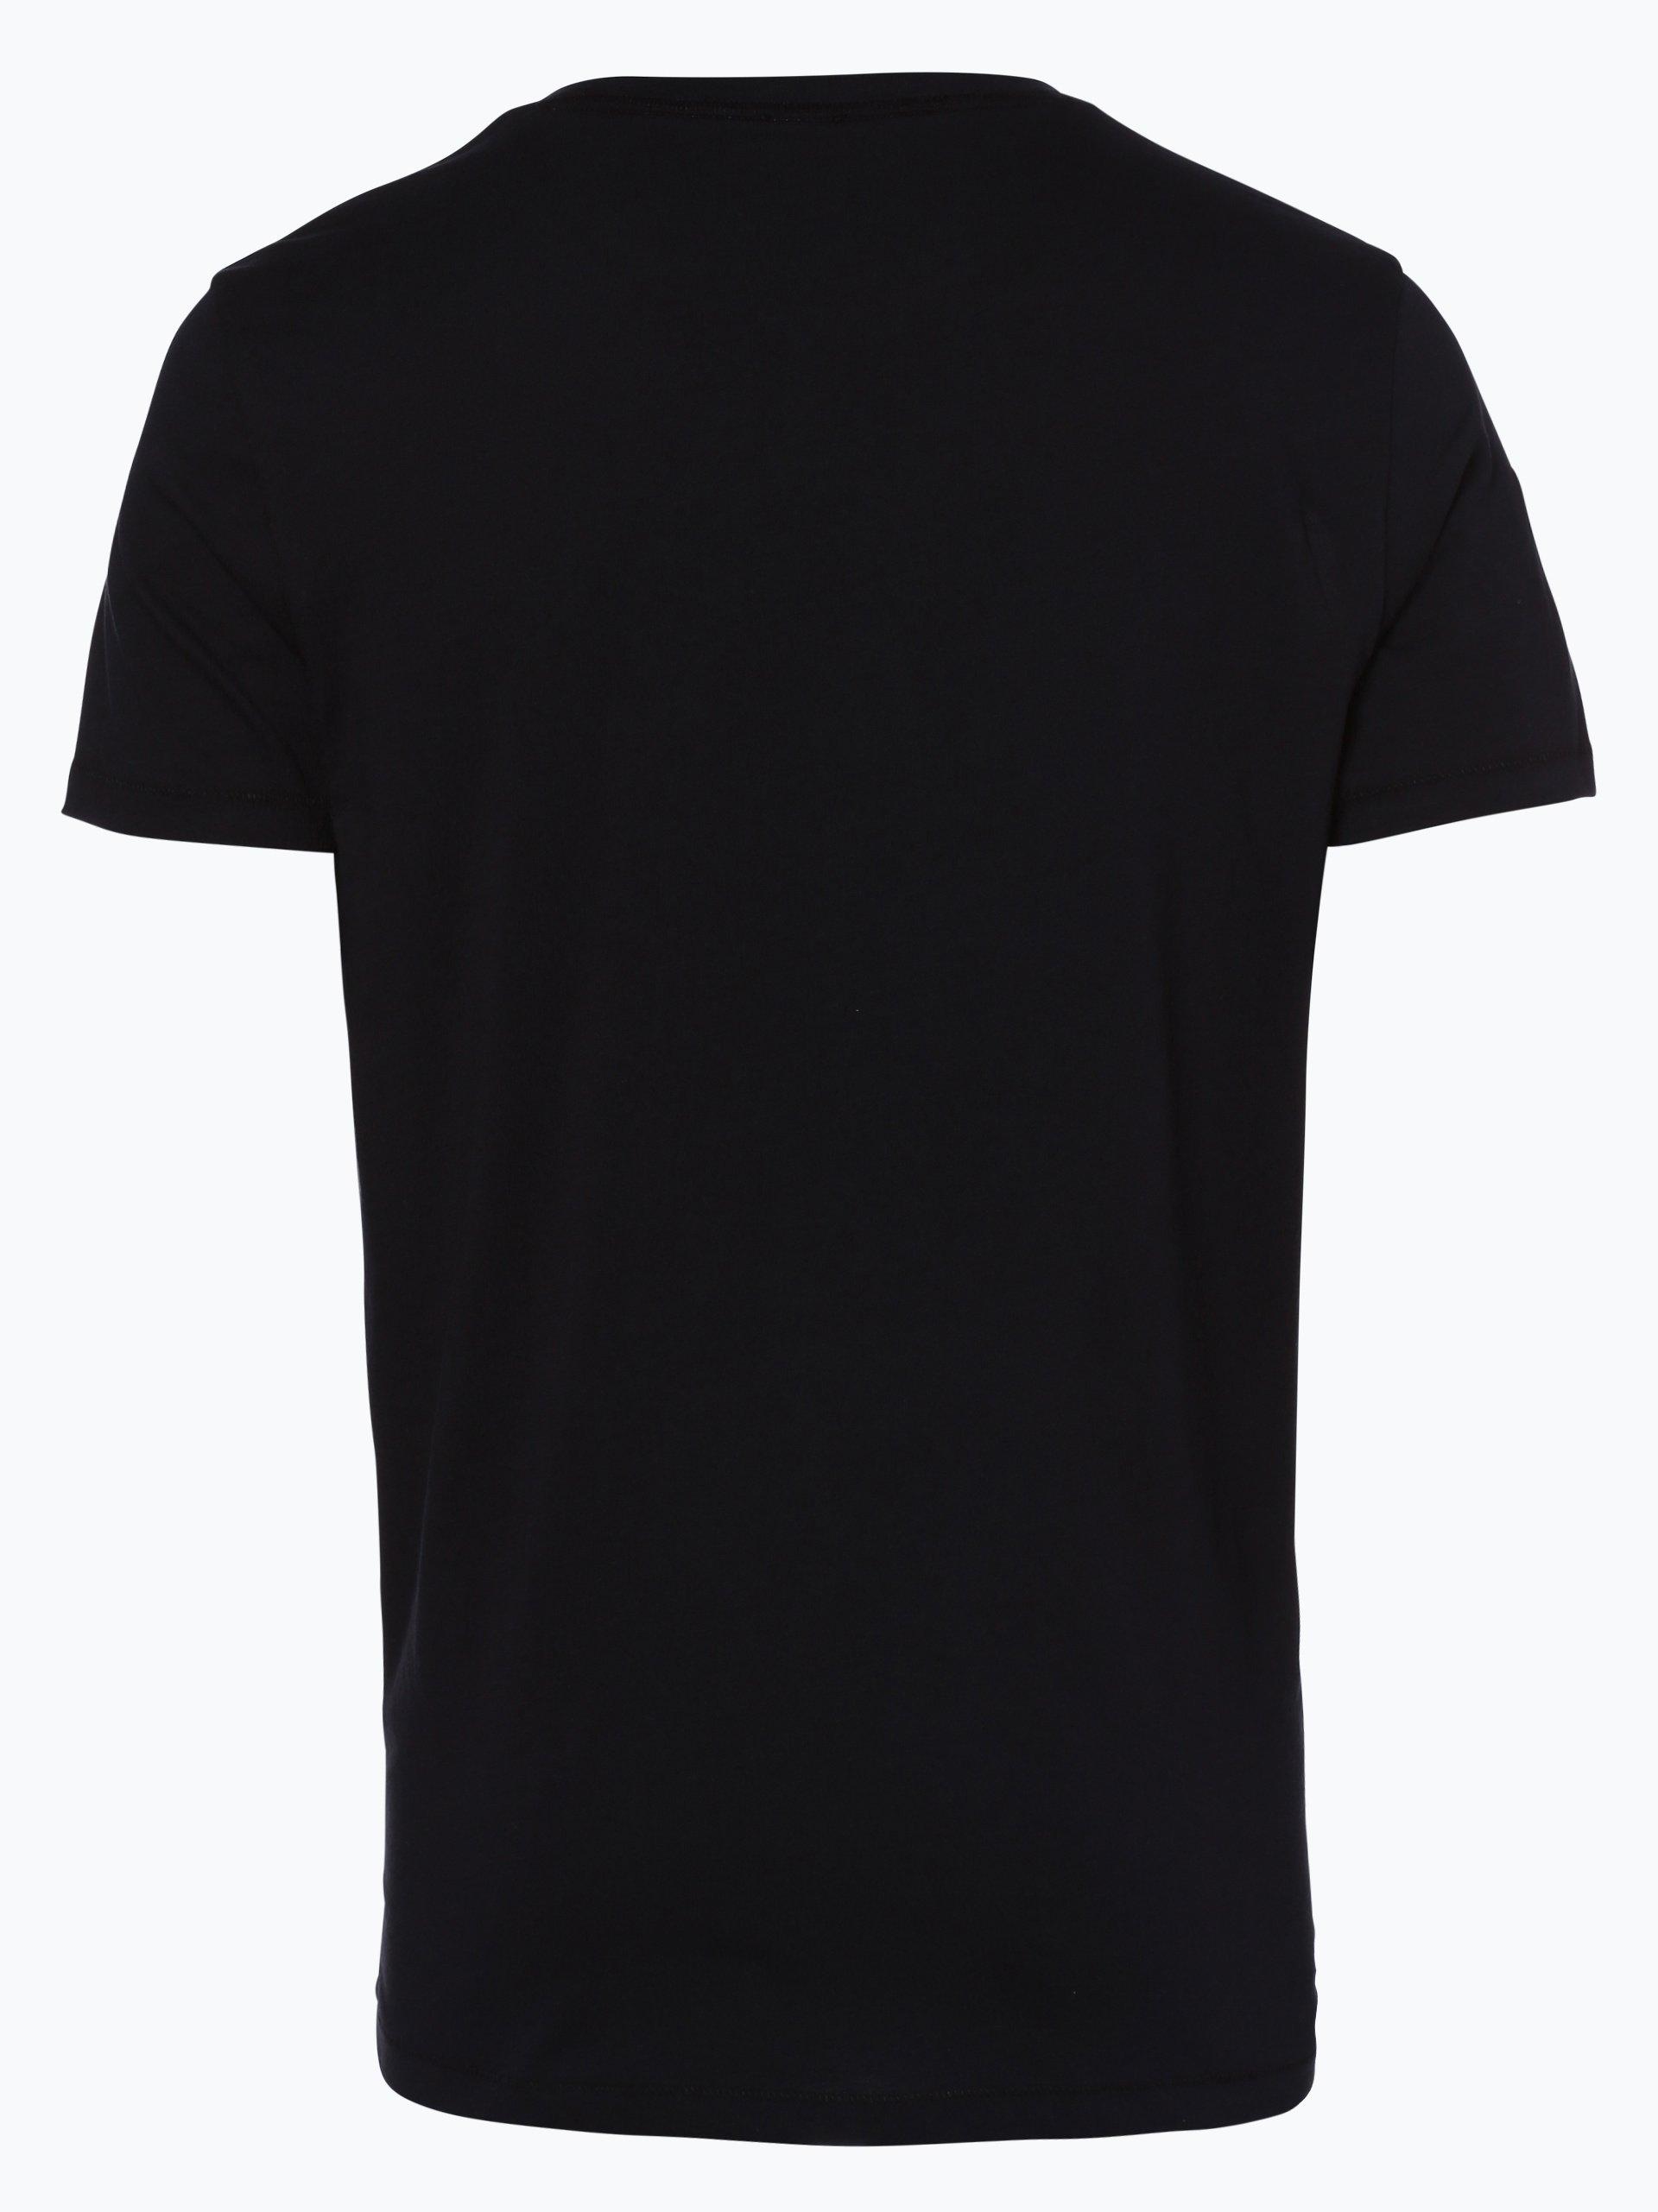 boss orange herren t shirt typer wei uni online kaufen. Black Bedroom Furniture Sets. Home Design Ideas